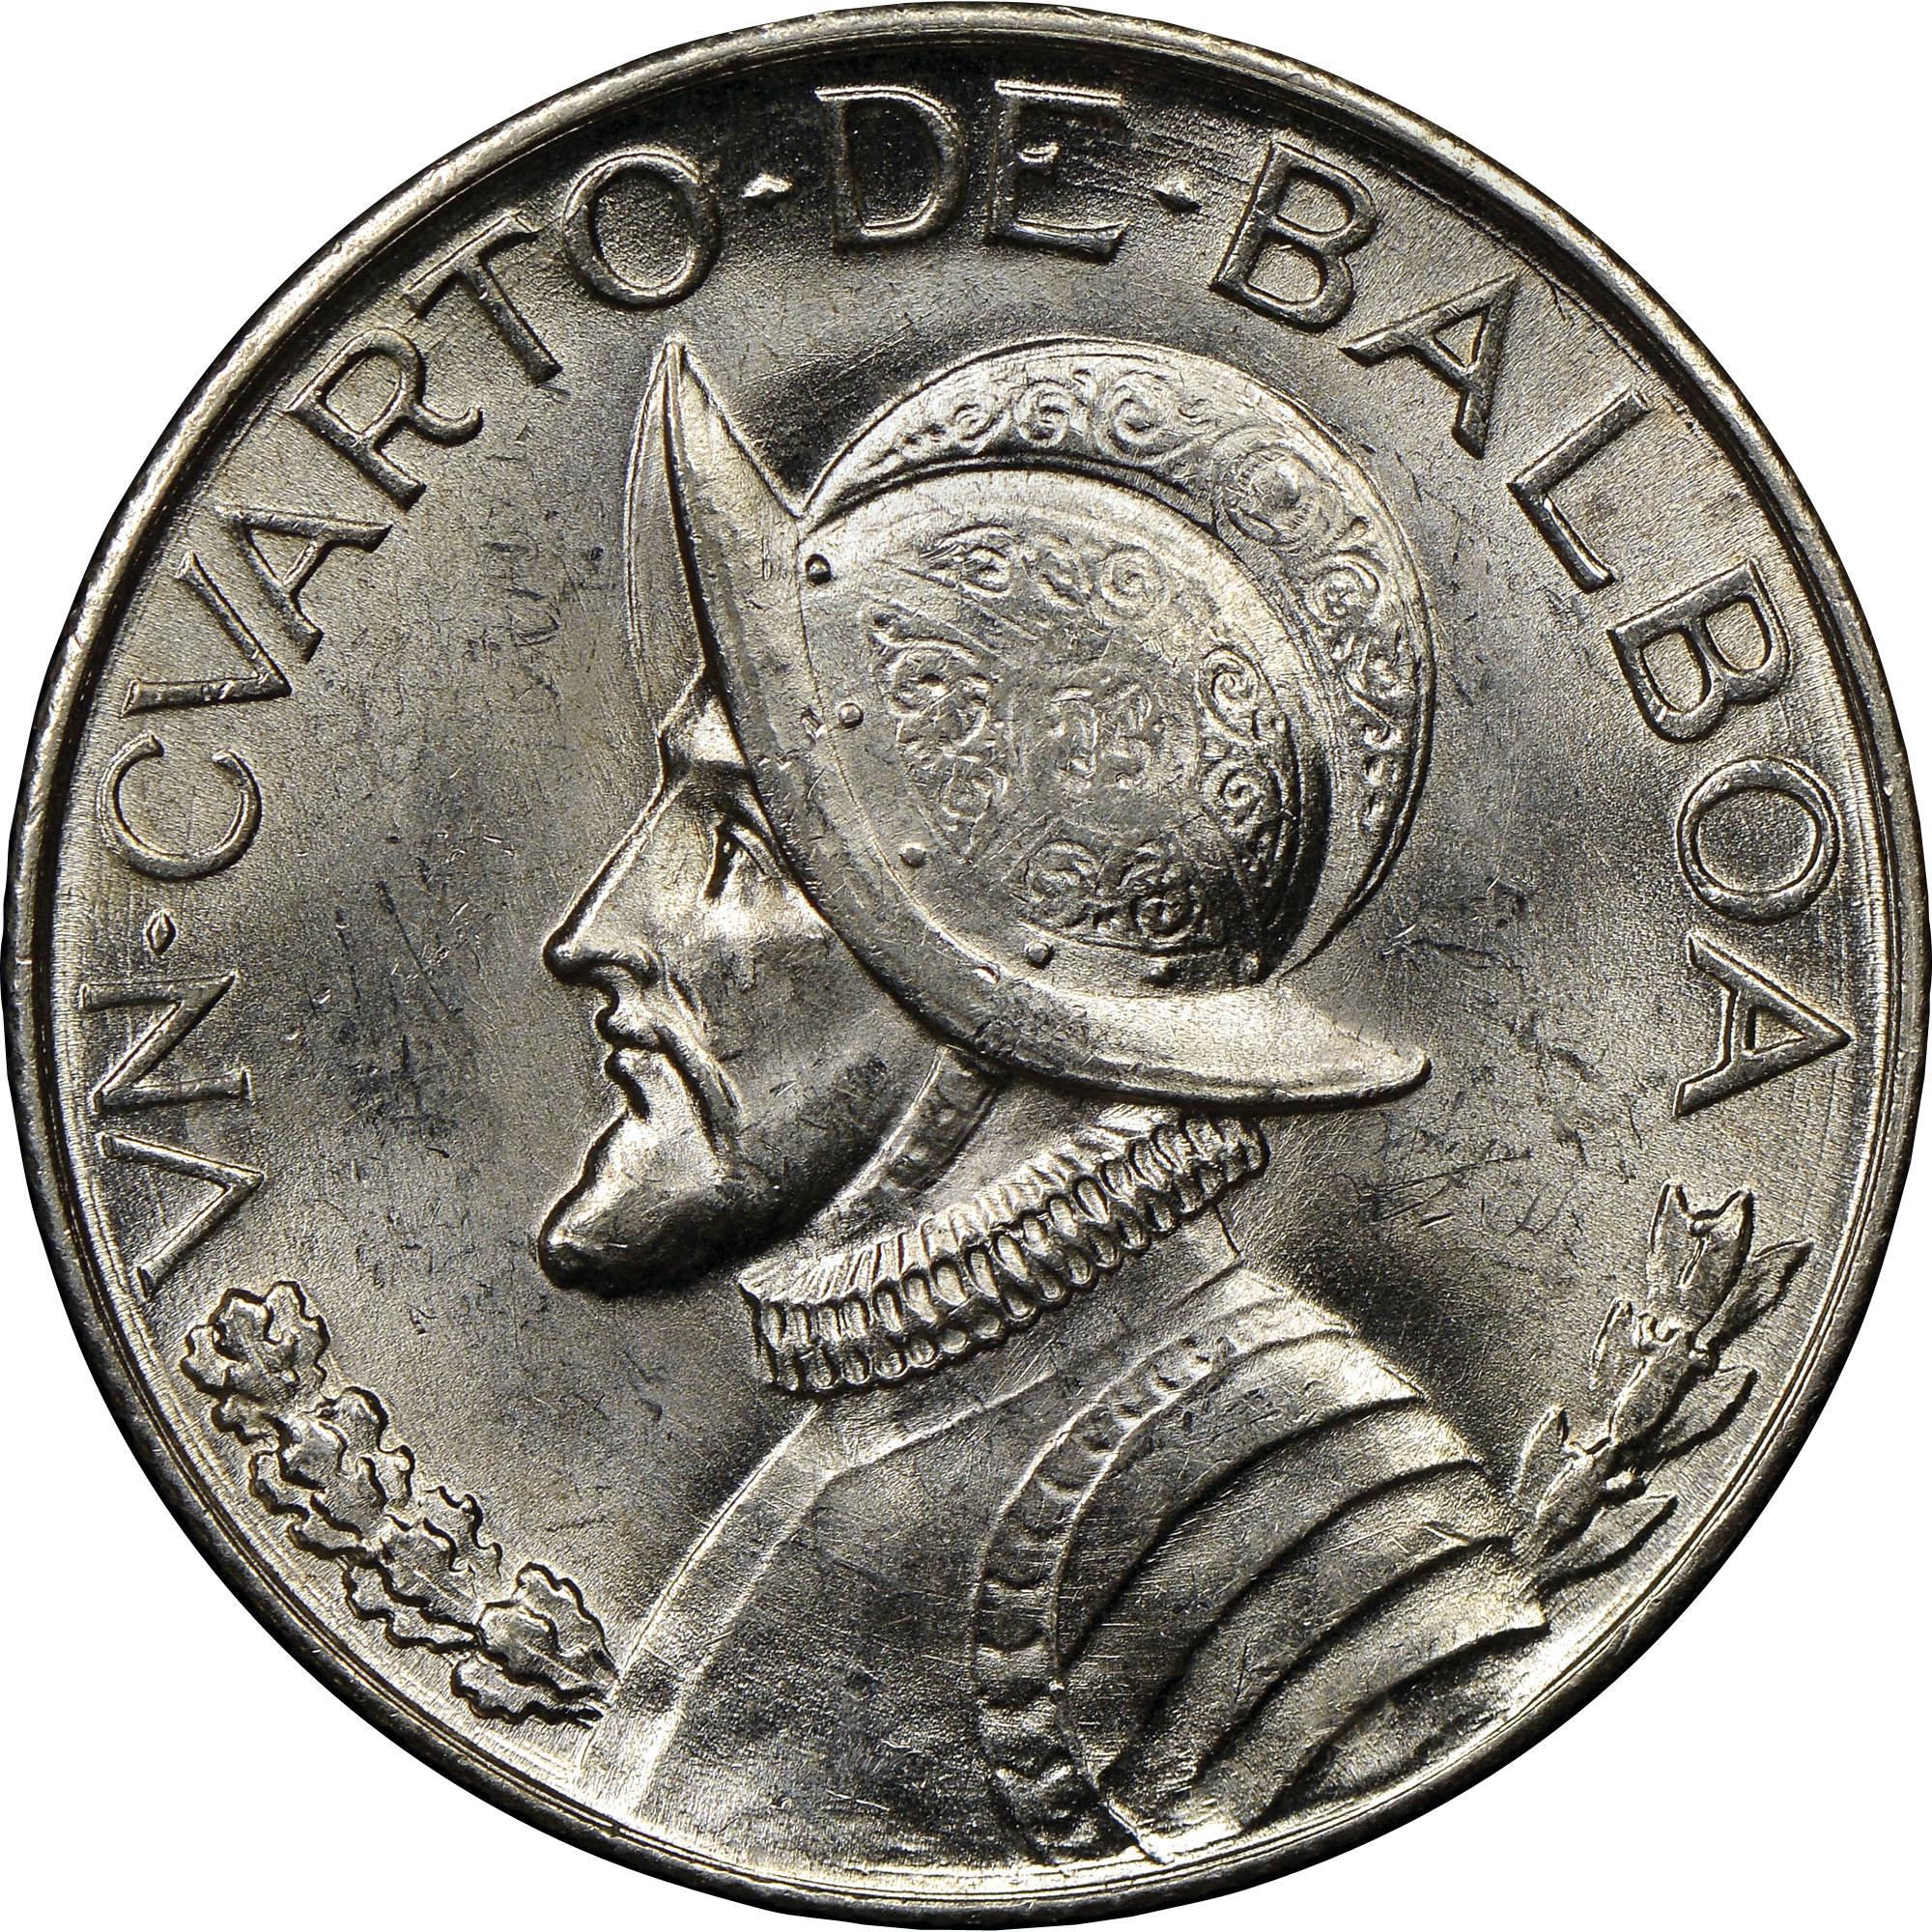 Coin Chart: Panama 1/4 Balboa KM 11.1 Prices & Values